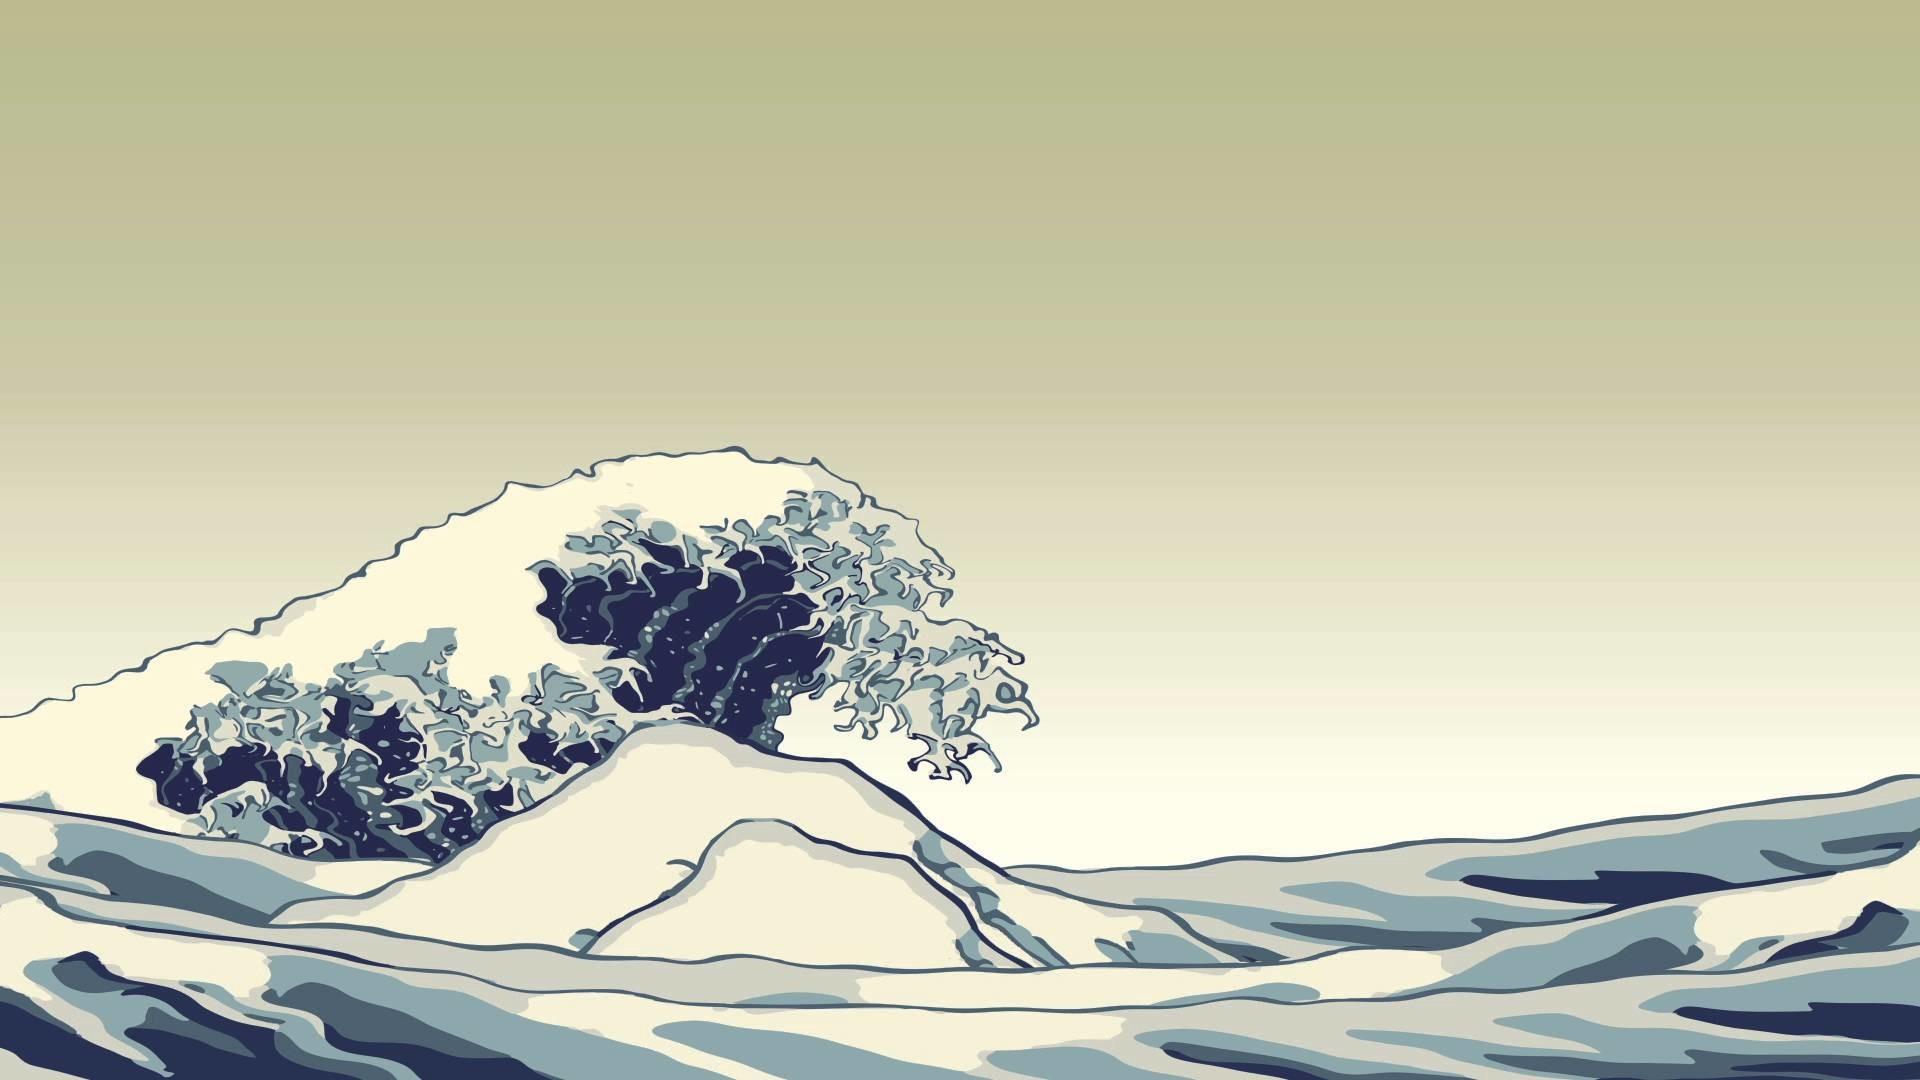 Snow Falling Wallpaper Download Ukiyo E Wallpaper 183 ① Wallpapertag